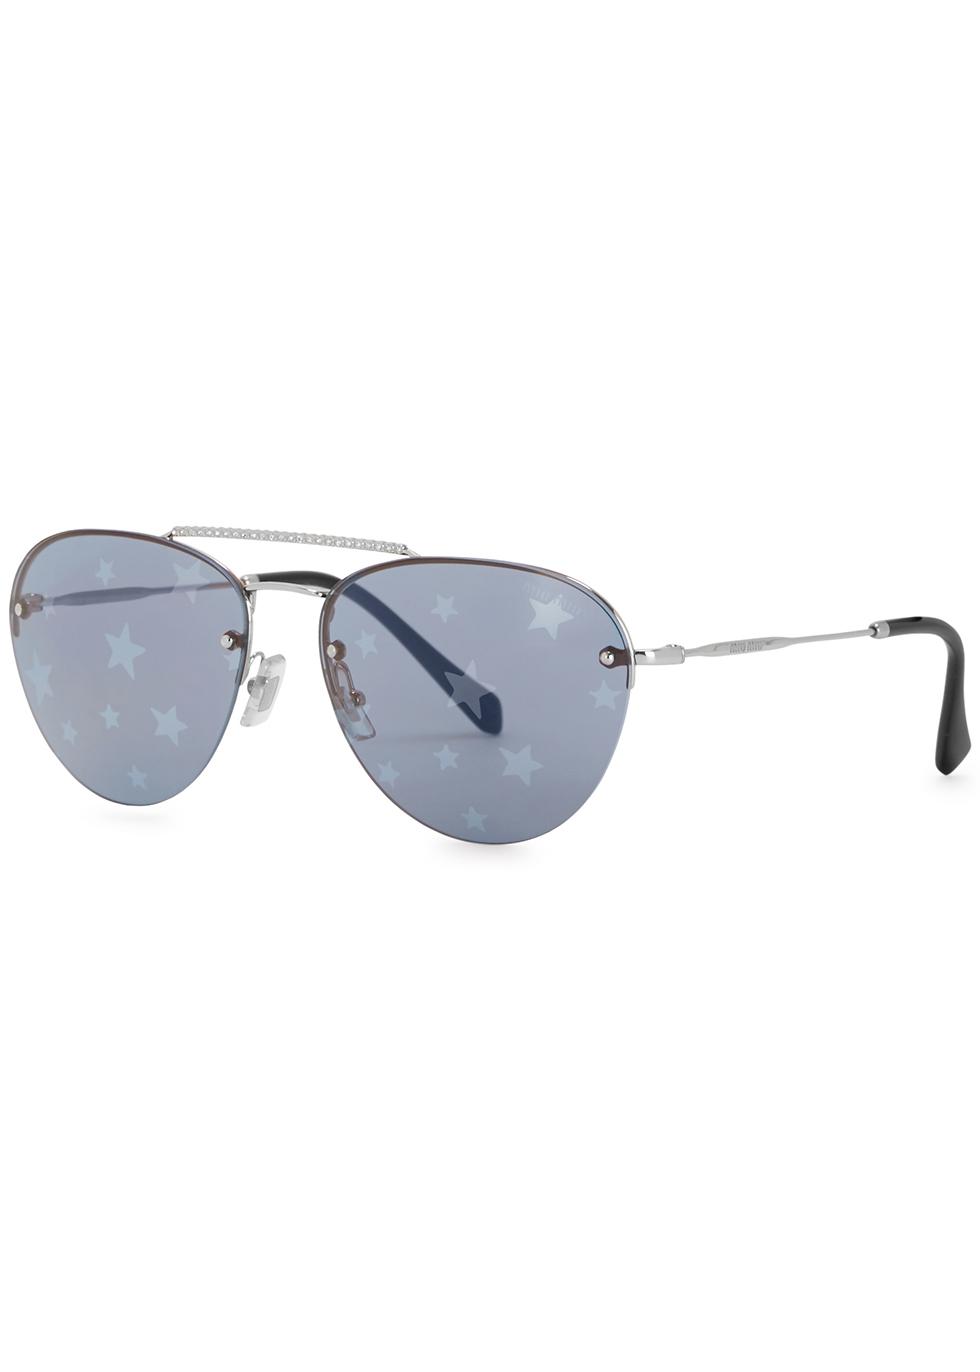 Star-print aviator-style sunglasses - Miu Miu